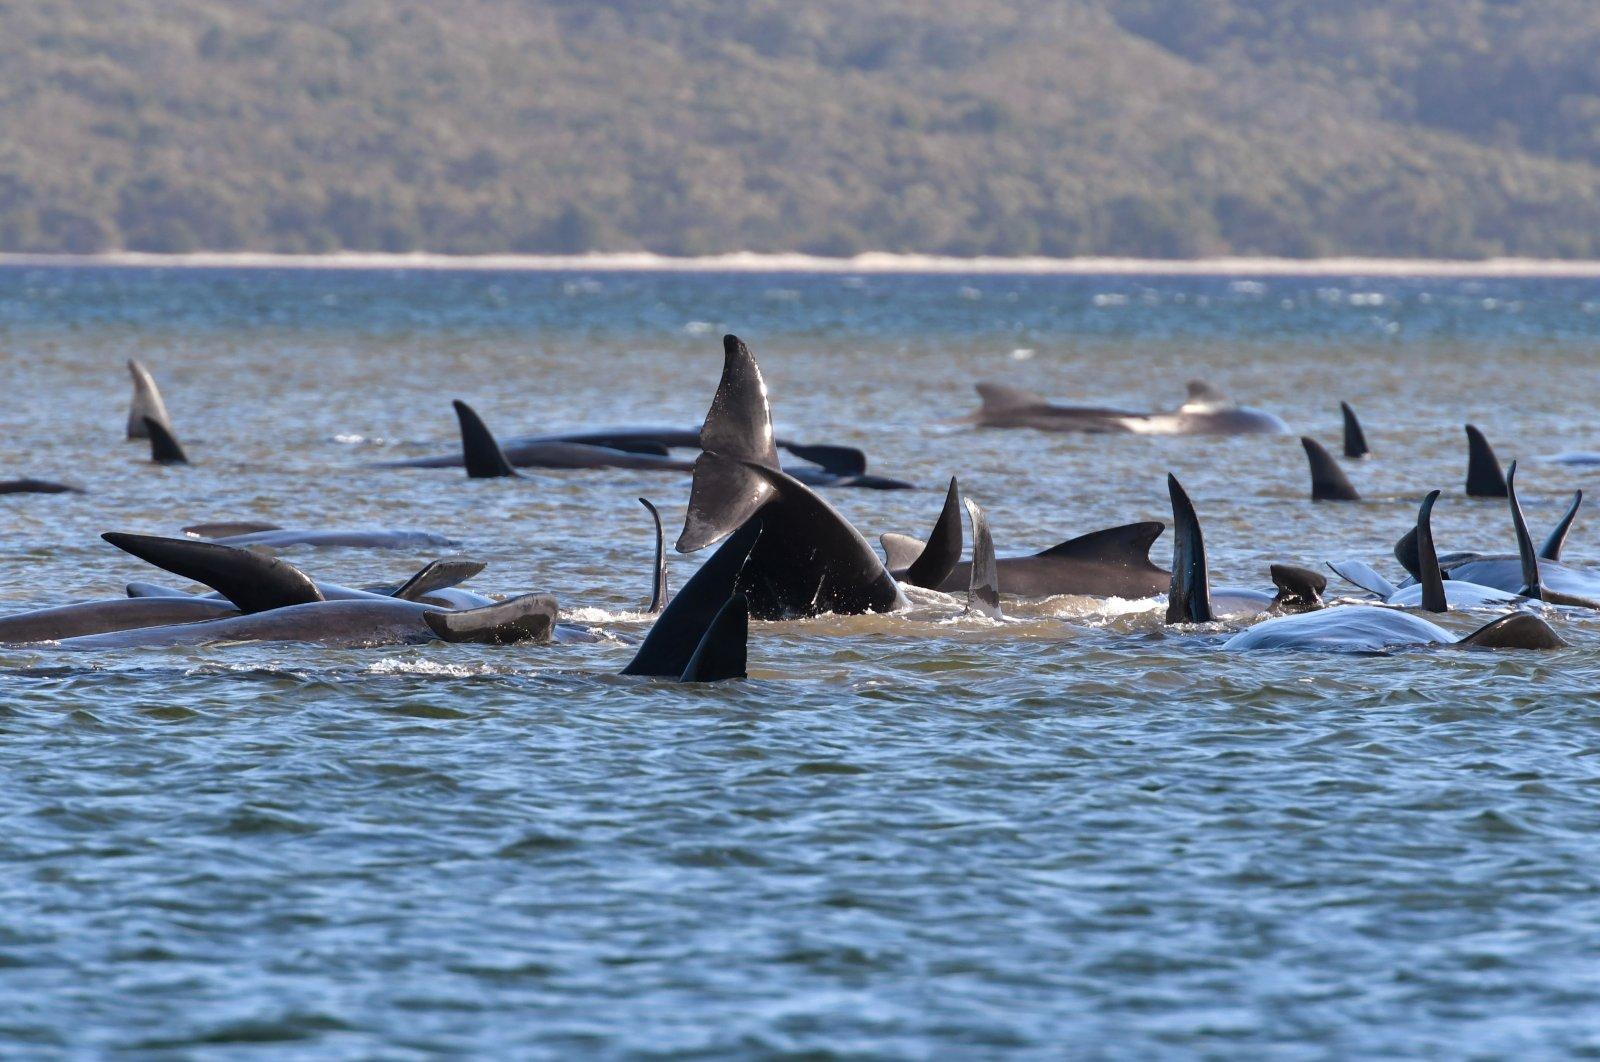 Pilot whales lie stranded on a sand bar near Strahan, Australia, Sept. 21, 2020. (AP Photo)